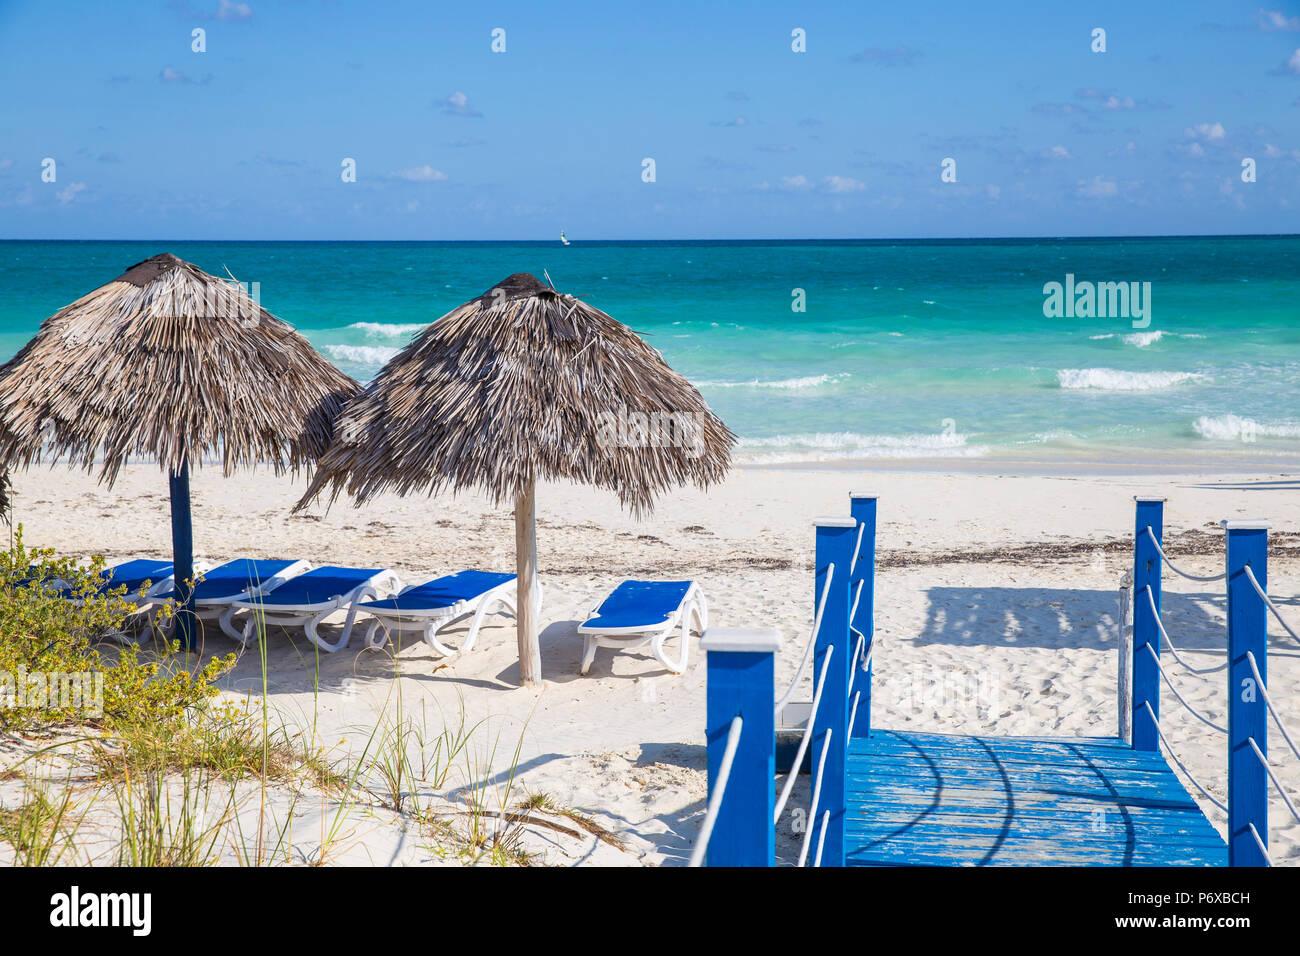 Cuba, Jardines del Rey, Cayo Guillermo, Playa Pilar Stock Photo